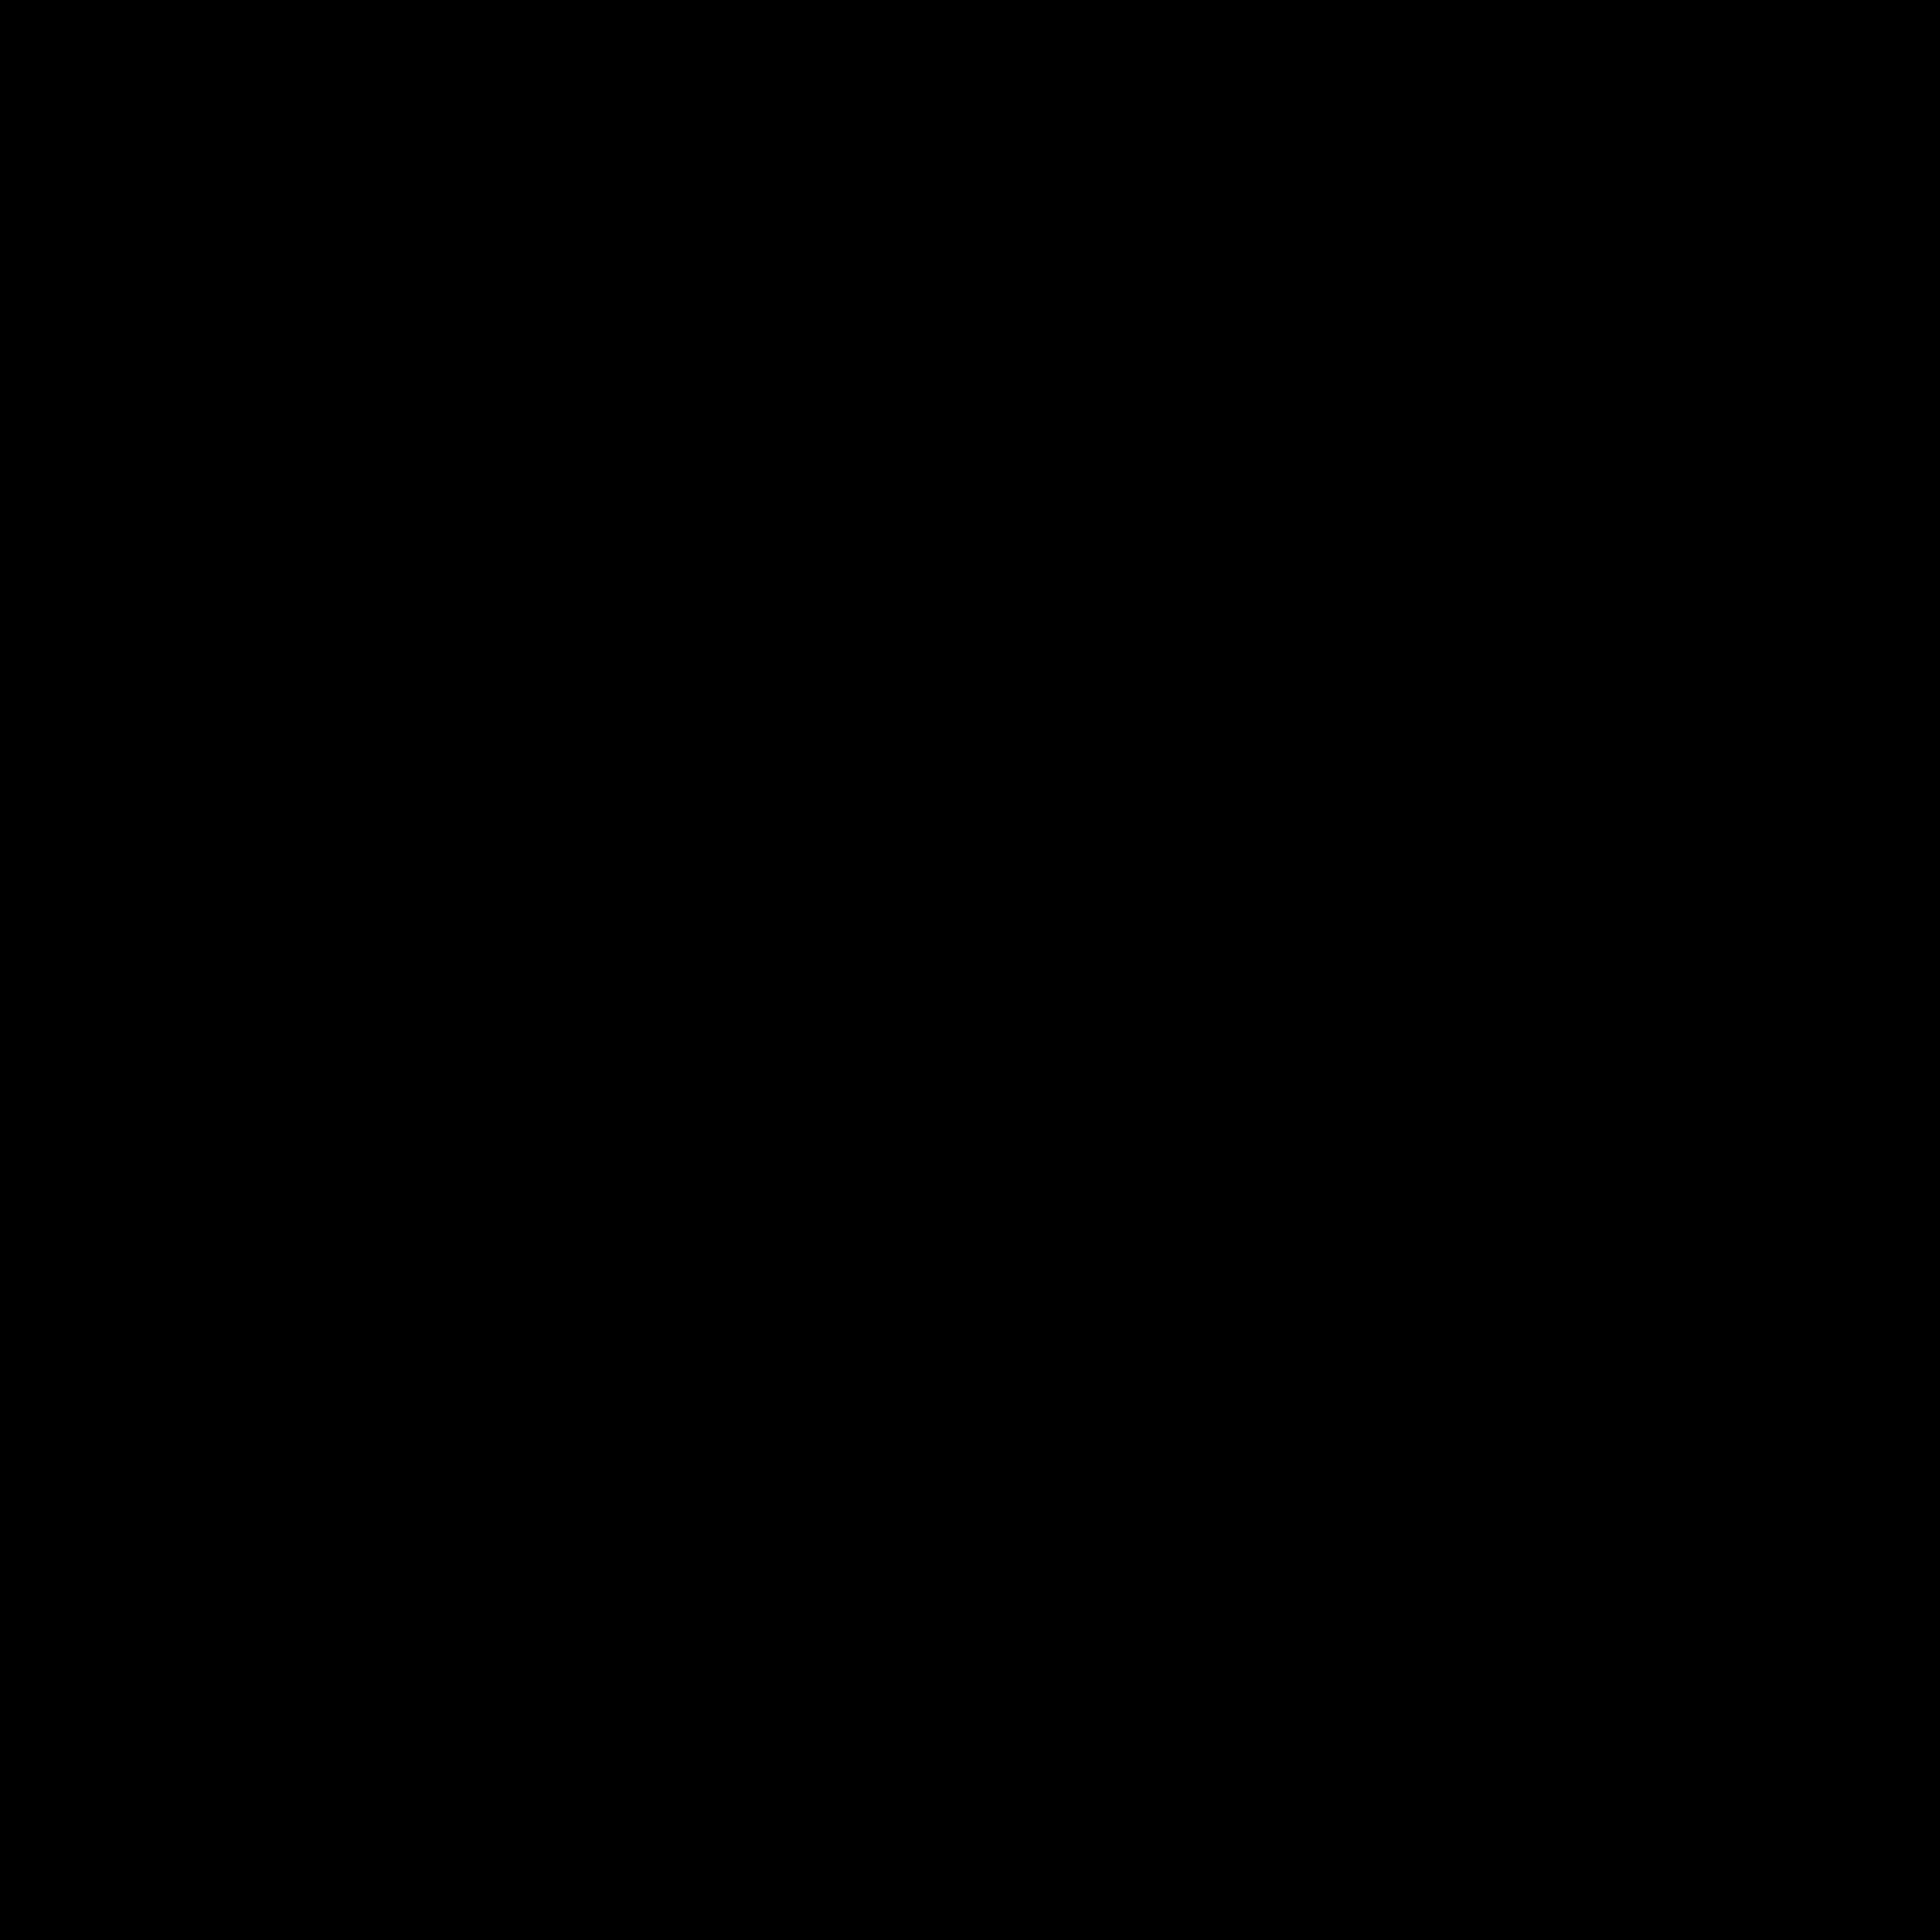 Department of Justice Logo PNG Transparent & SVG Vector ...